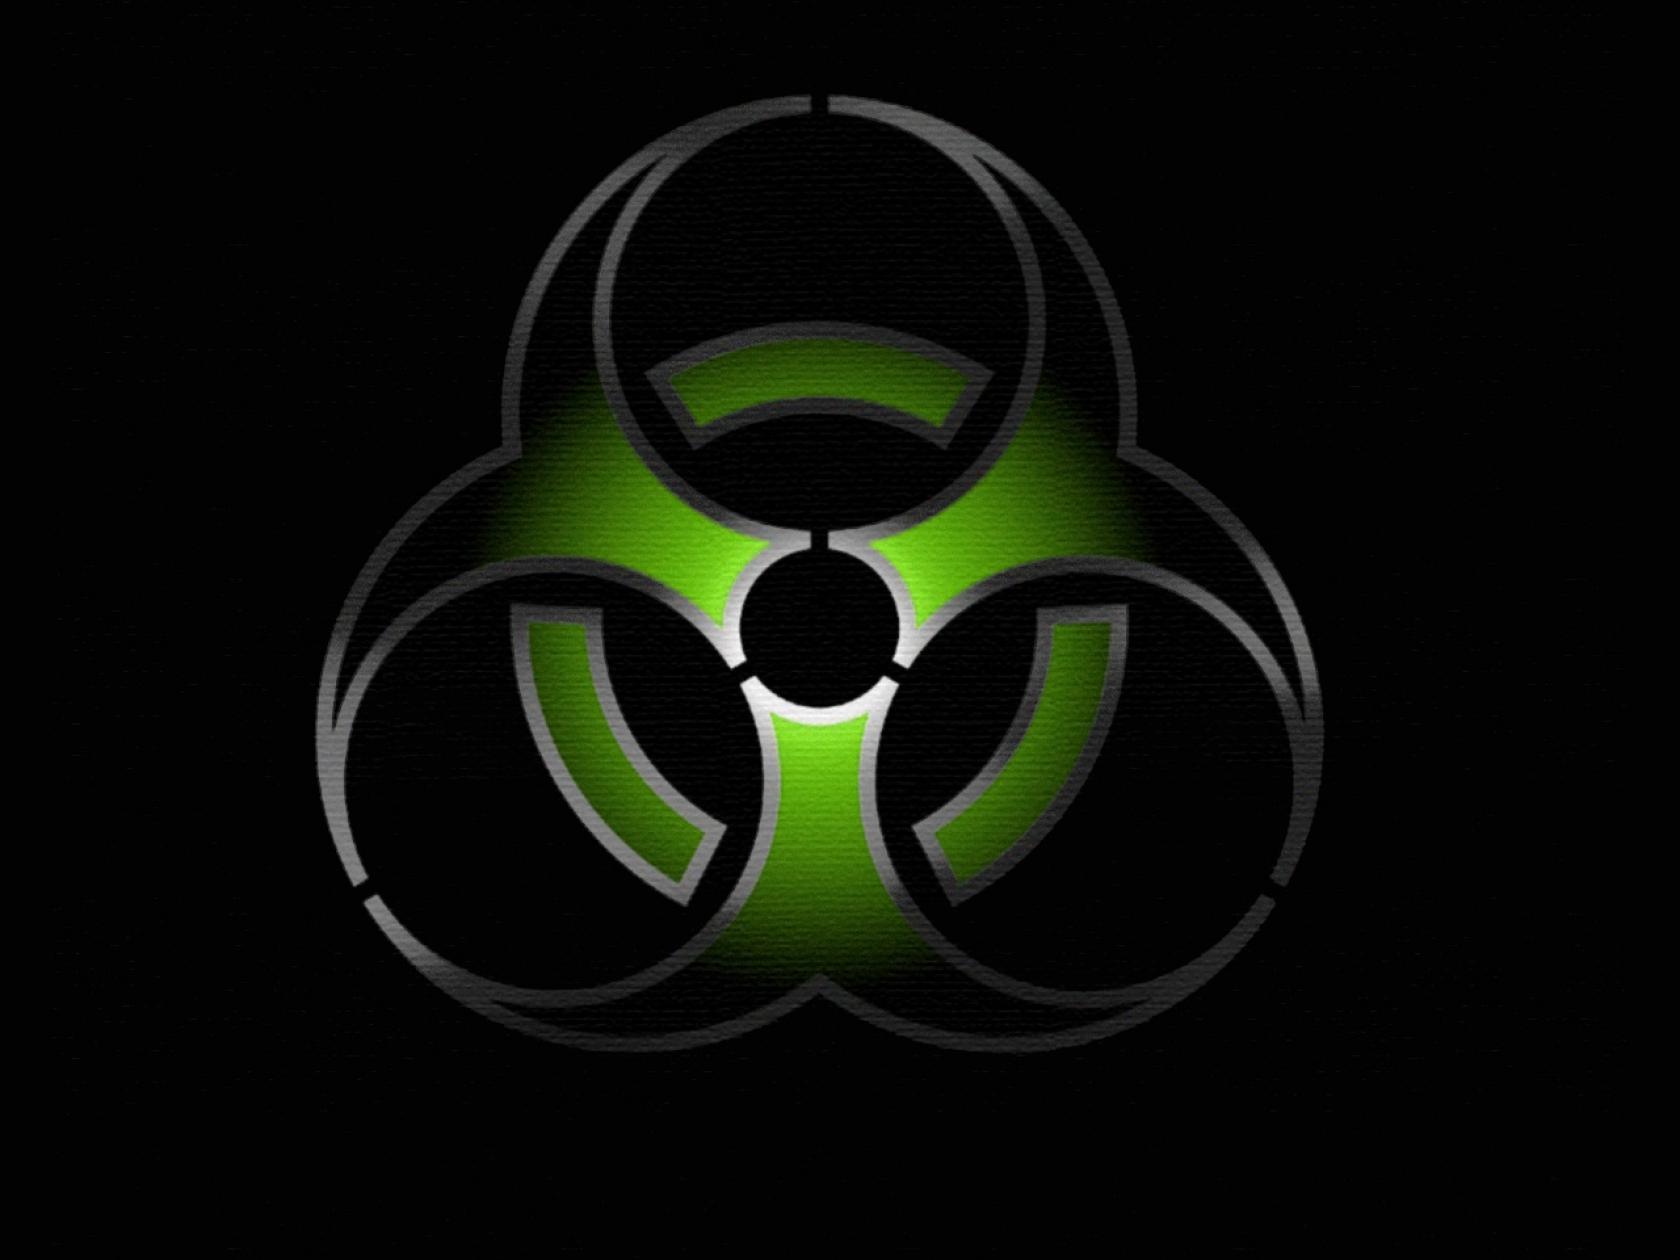 Gallery For gt Green Biohazard Hd 1680x1260